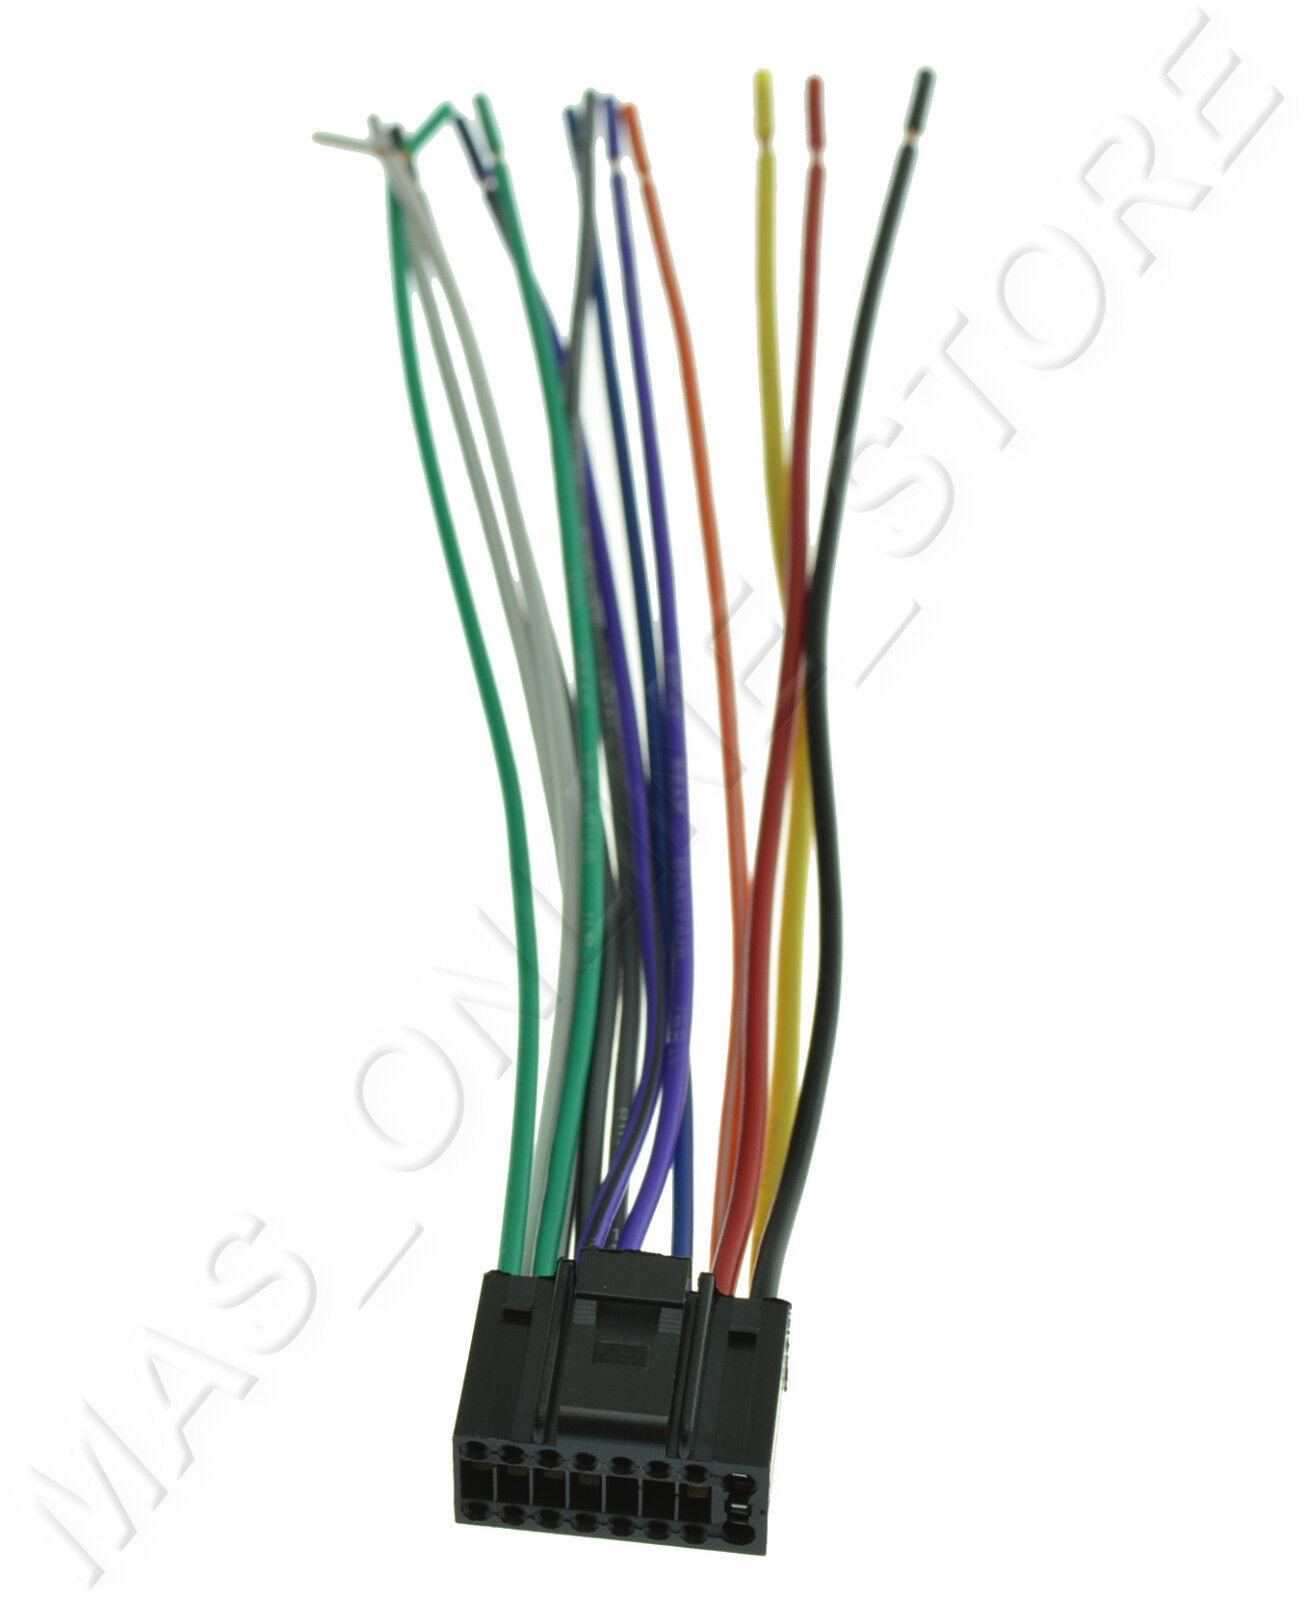 Jvc Kd S29 Wiring Diagram